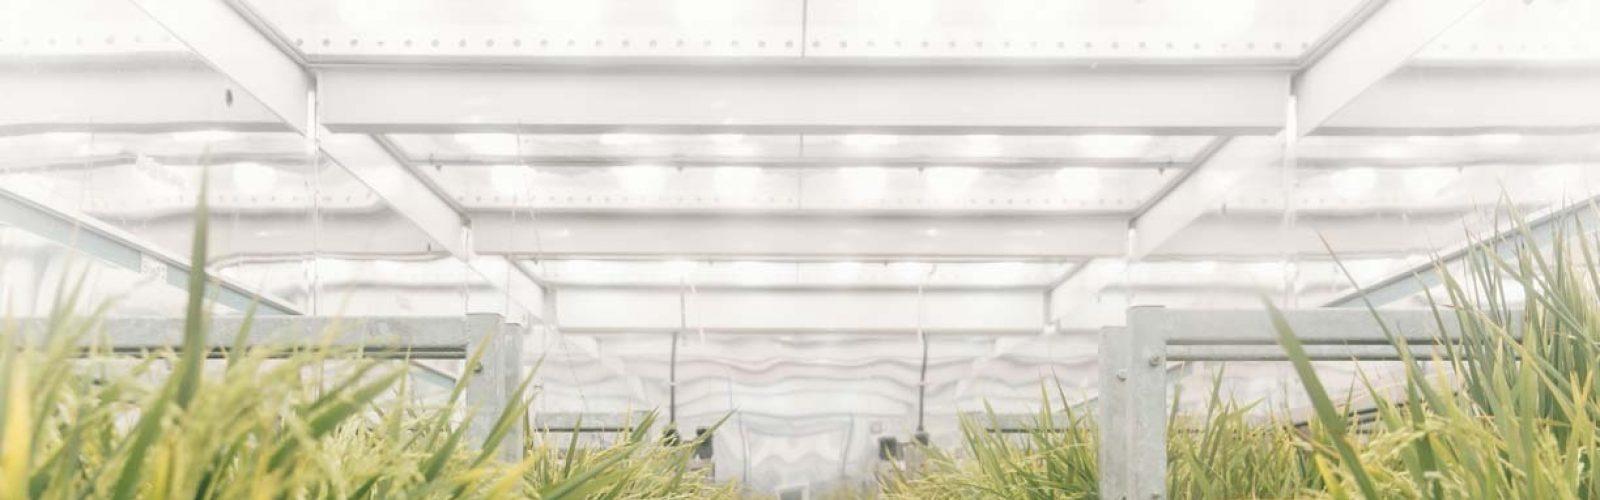 sheffield-university-plant-growth-room 5